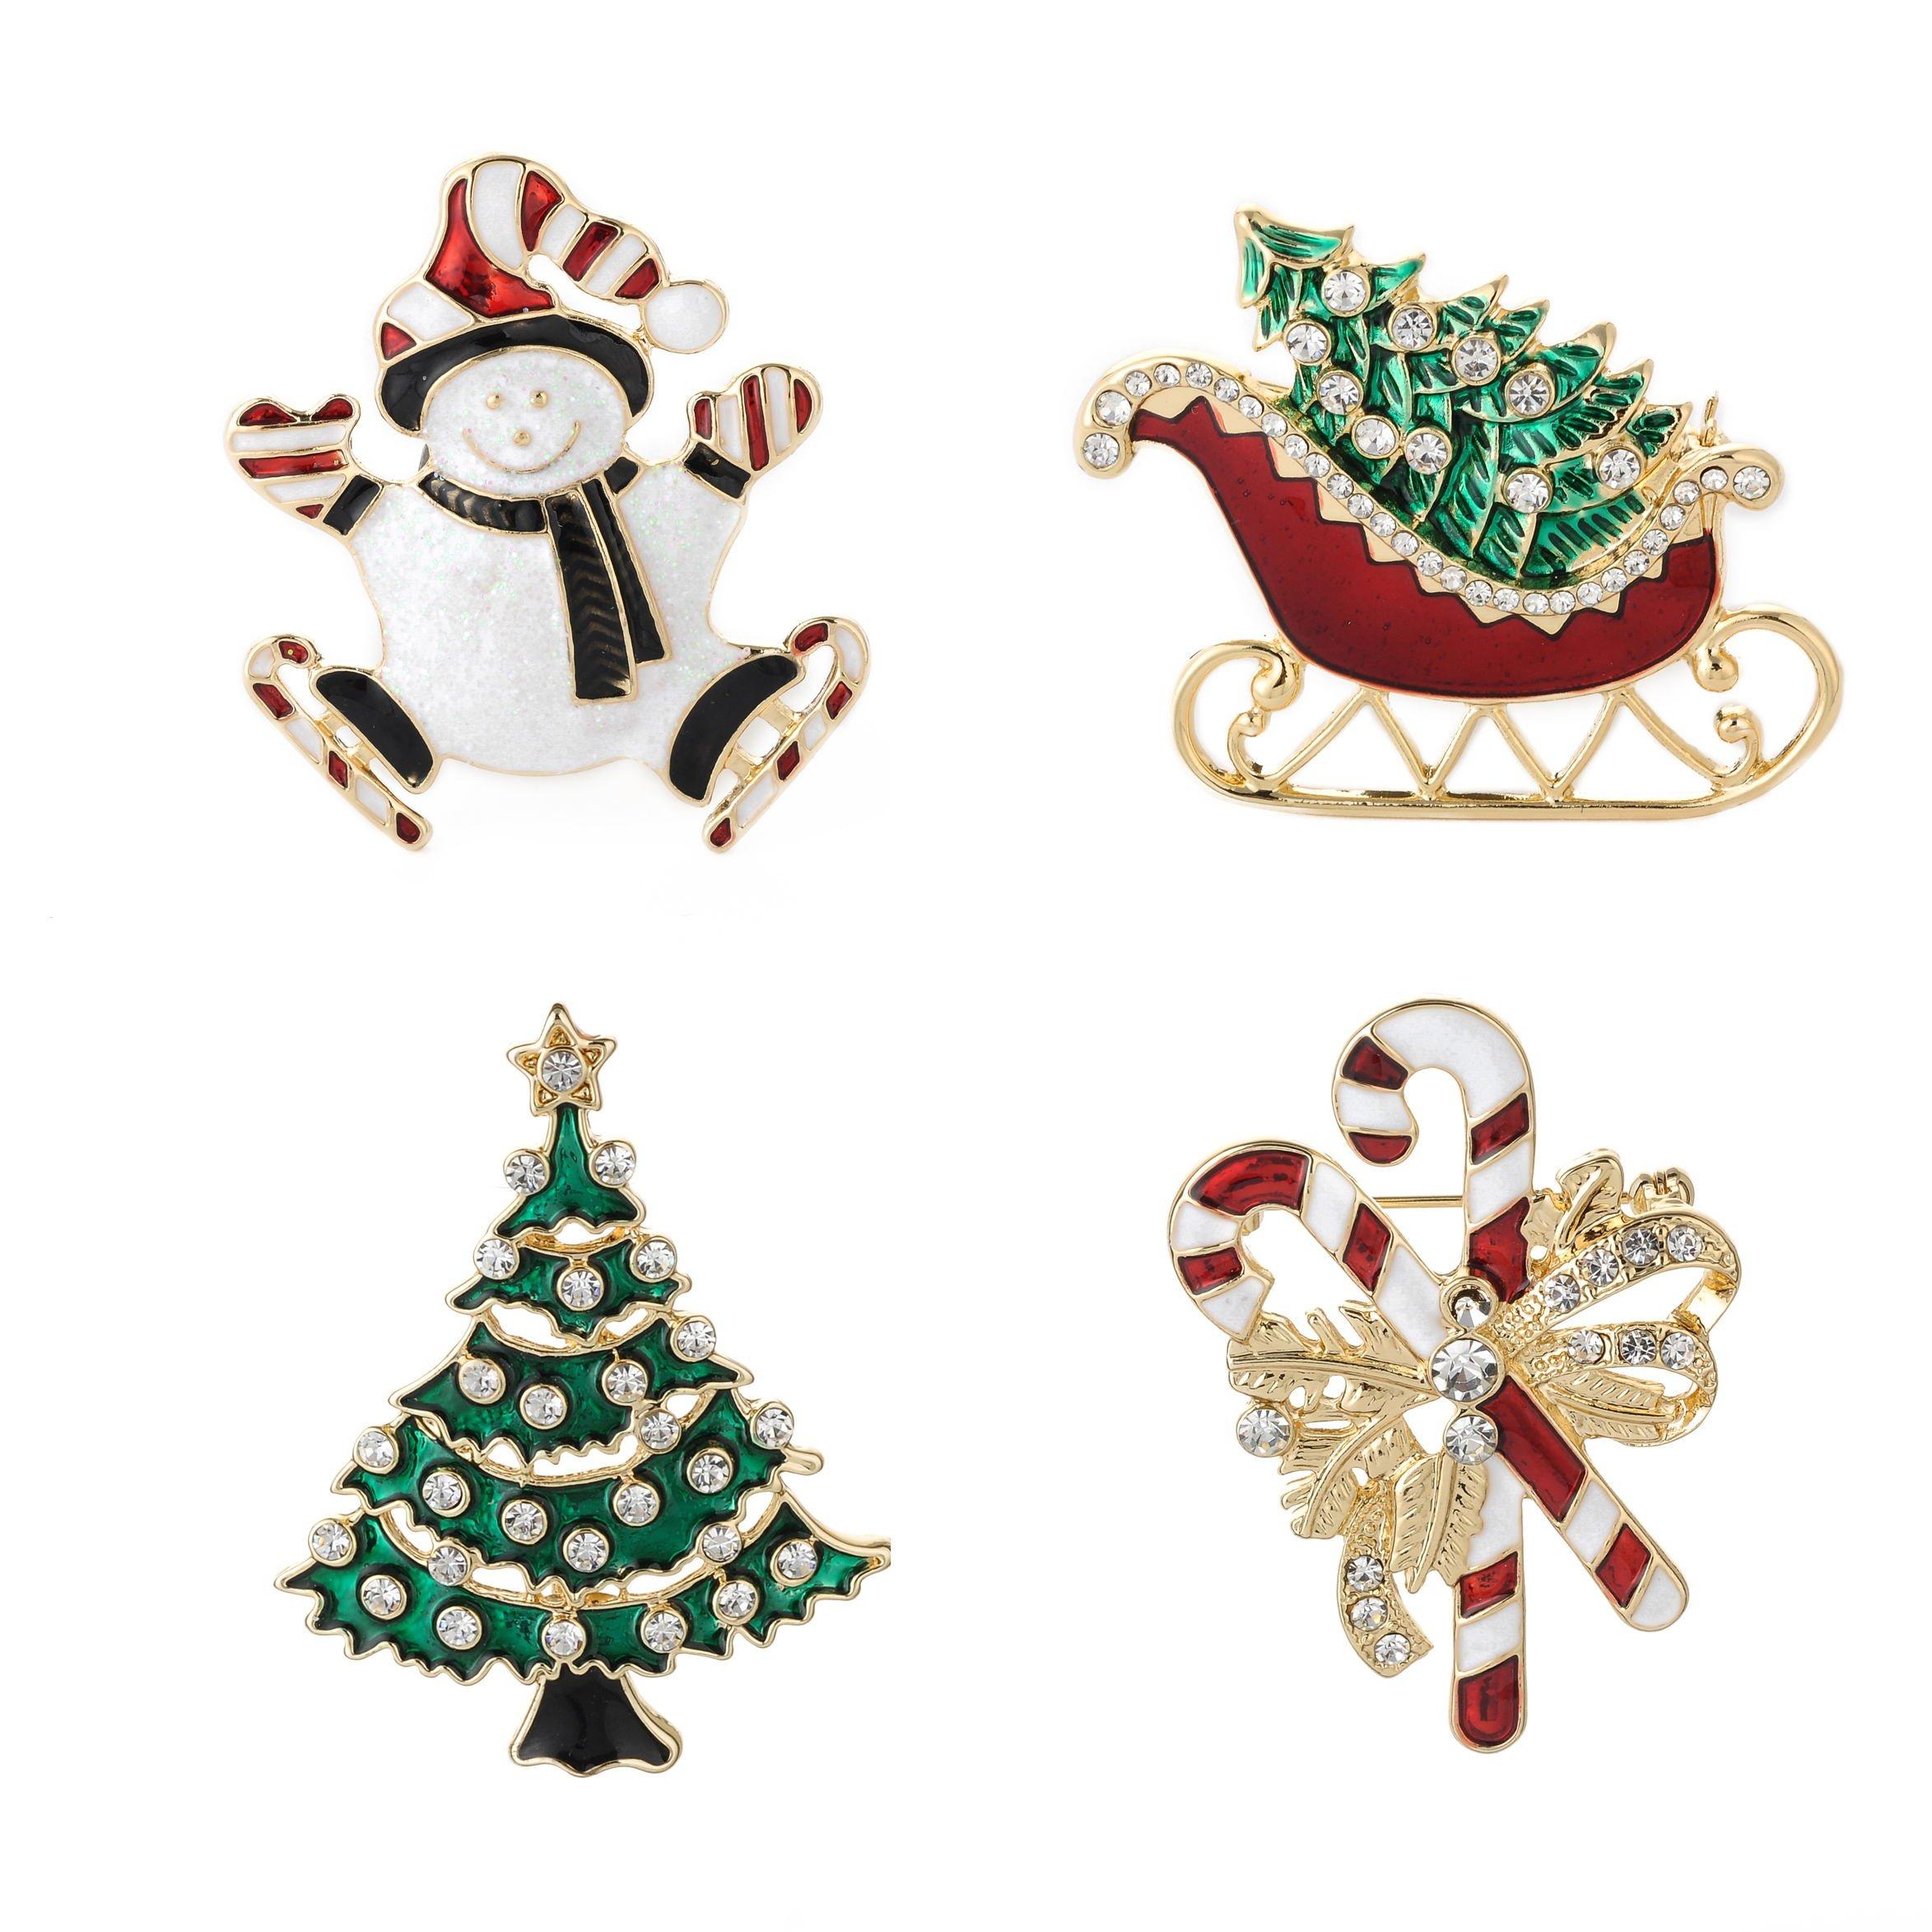 Jewelry Christmas Brooch Pins set Holiday Brooch Christmas Tree Snowman Xmas Pin Lot Party Favor Christmas Brooch Pin Set gifts jewerly christmas brooches pins set